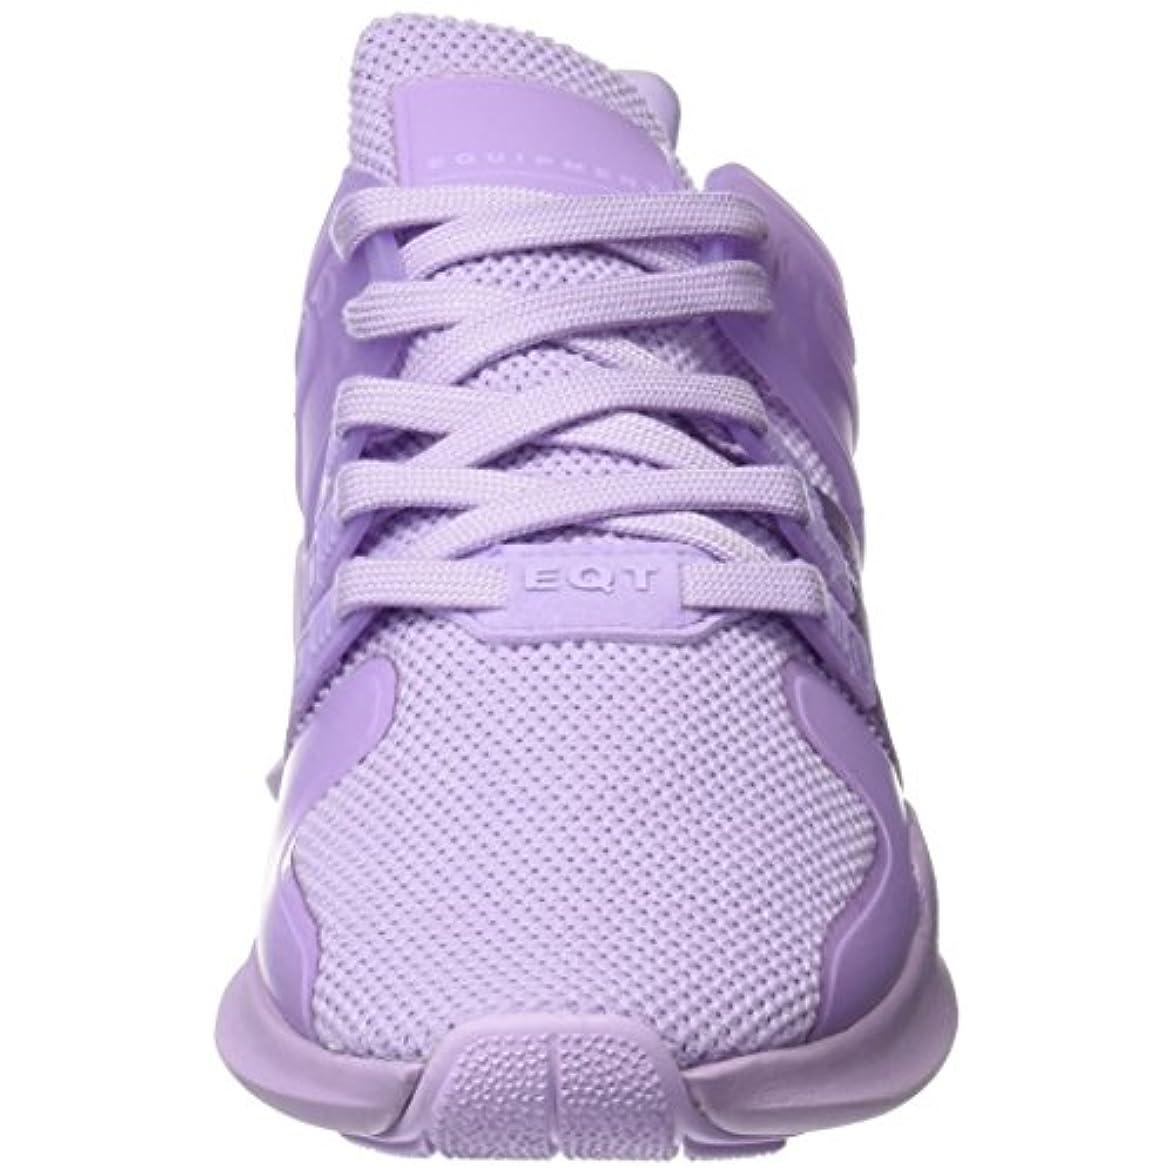 Adidas Eqt Support Adv W Scarpe Da Ginnastica Donna